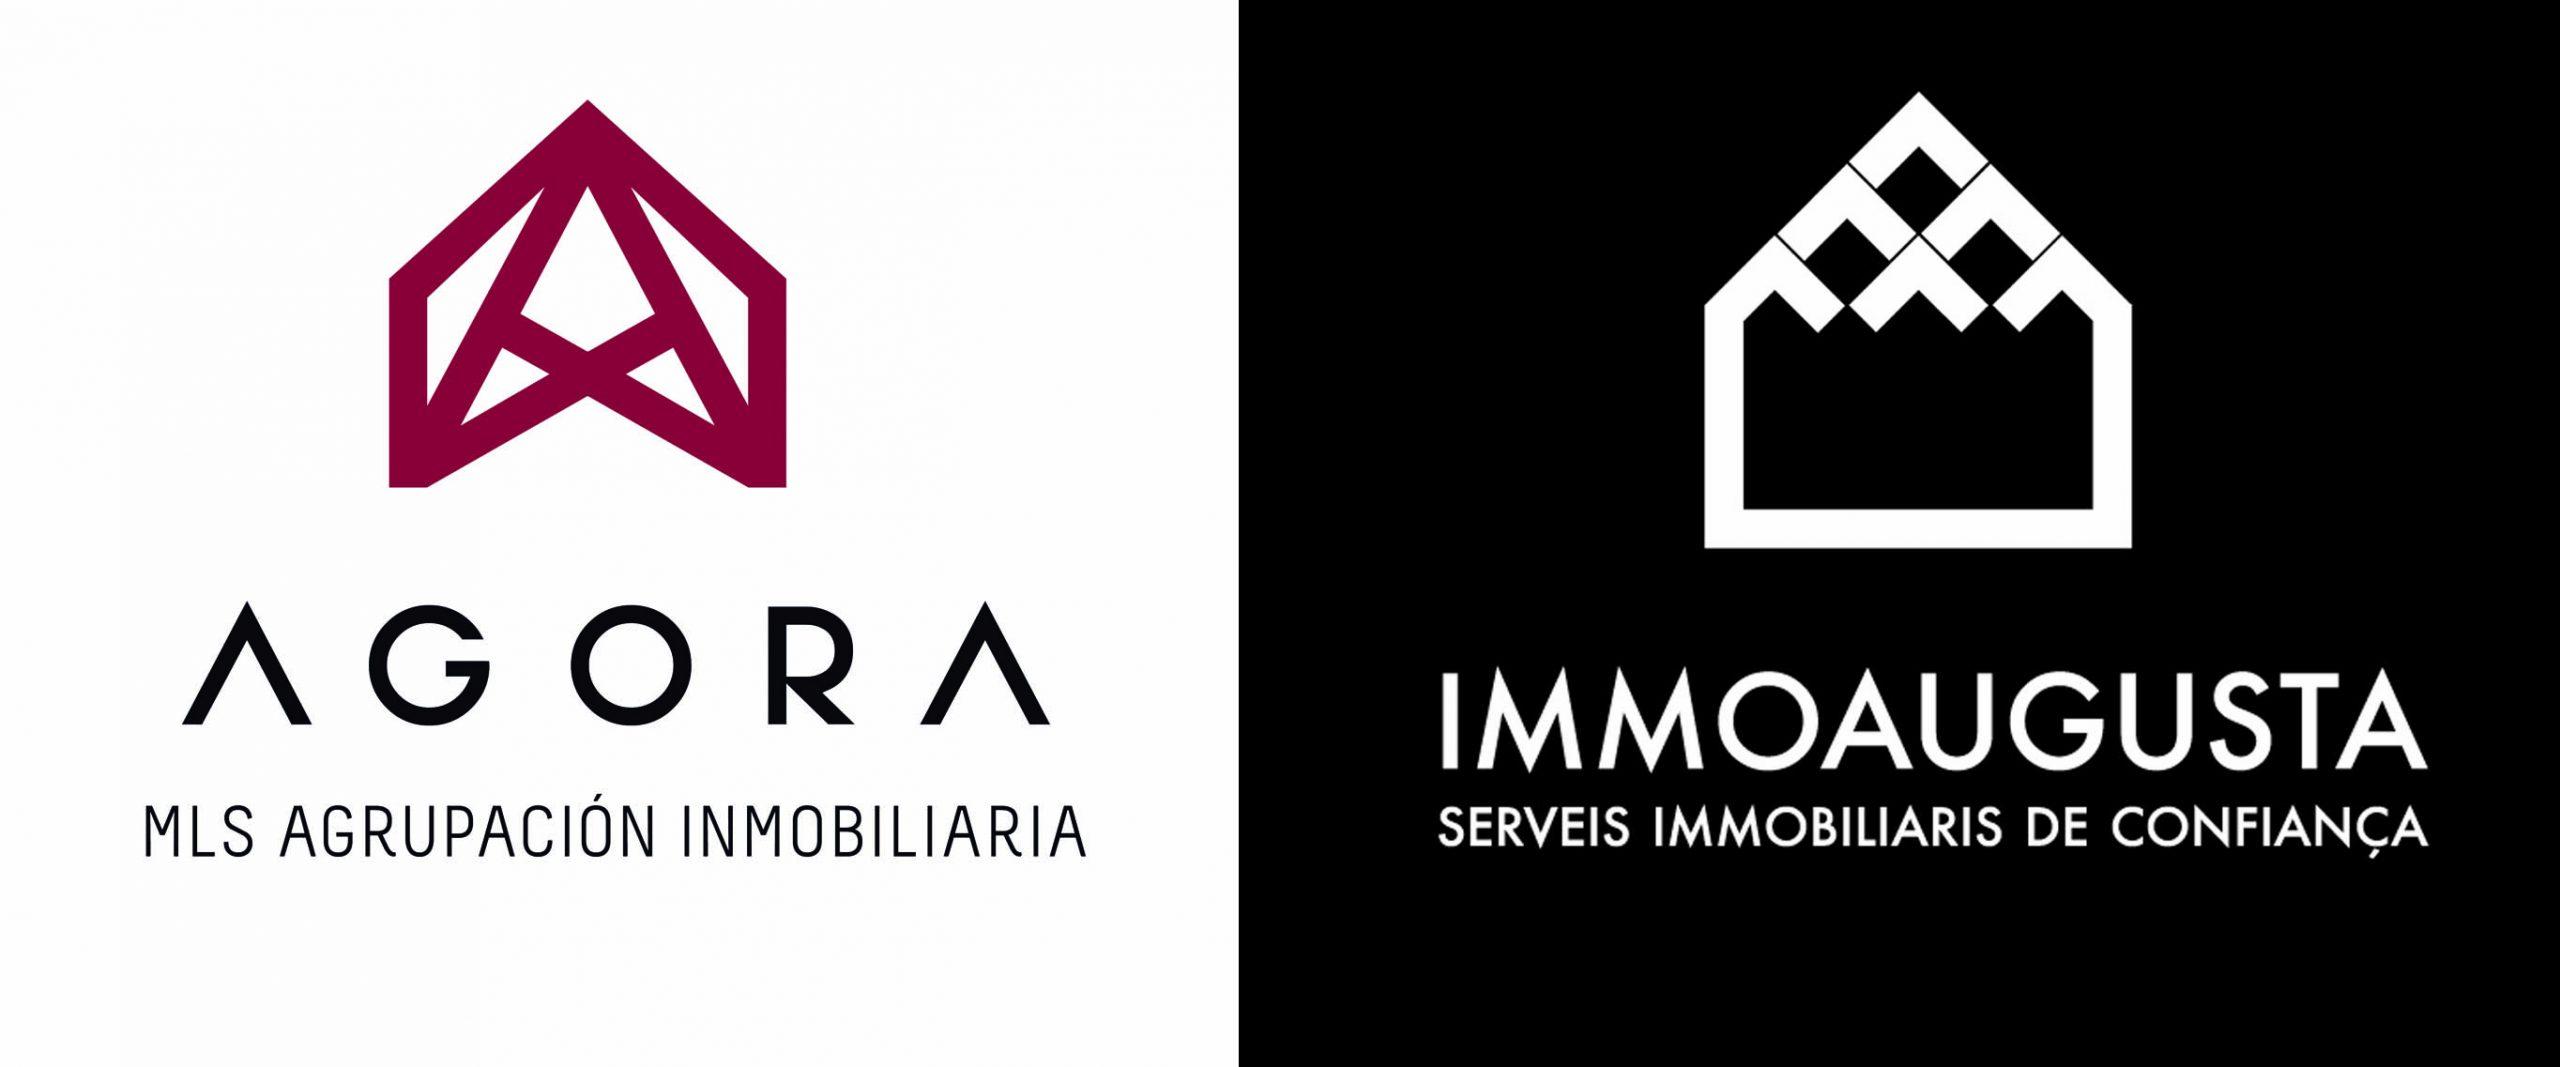 agora immoaugusta logos barcelona vender piso barcelona immoaugusta agencia inmobiliaria de confianza barcelona scaled